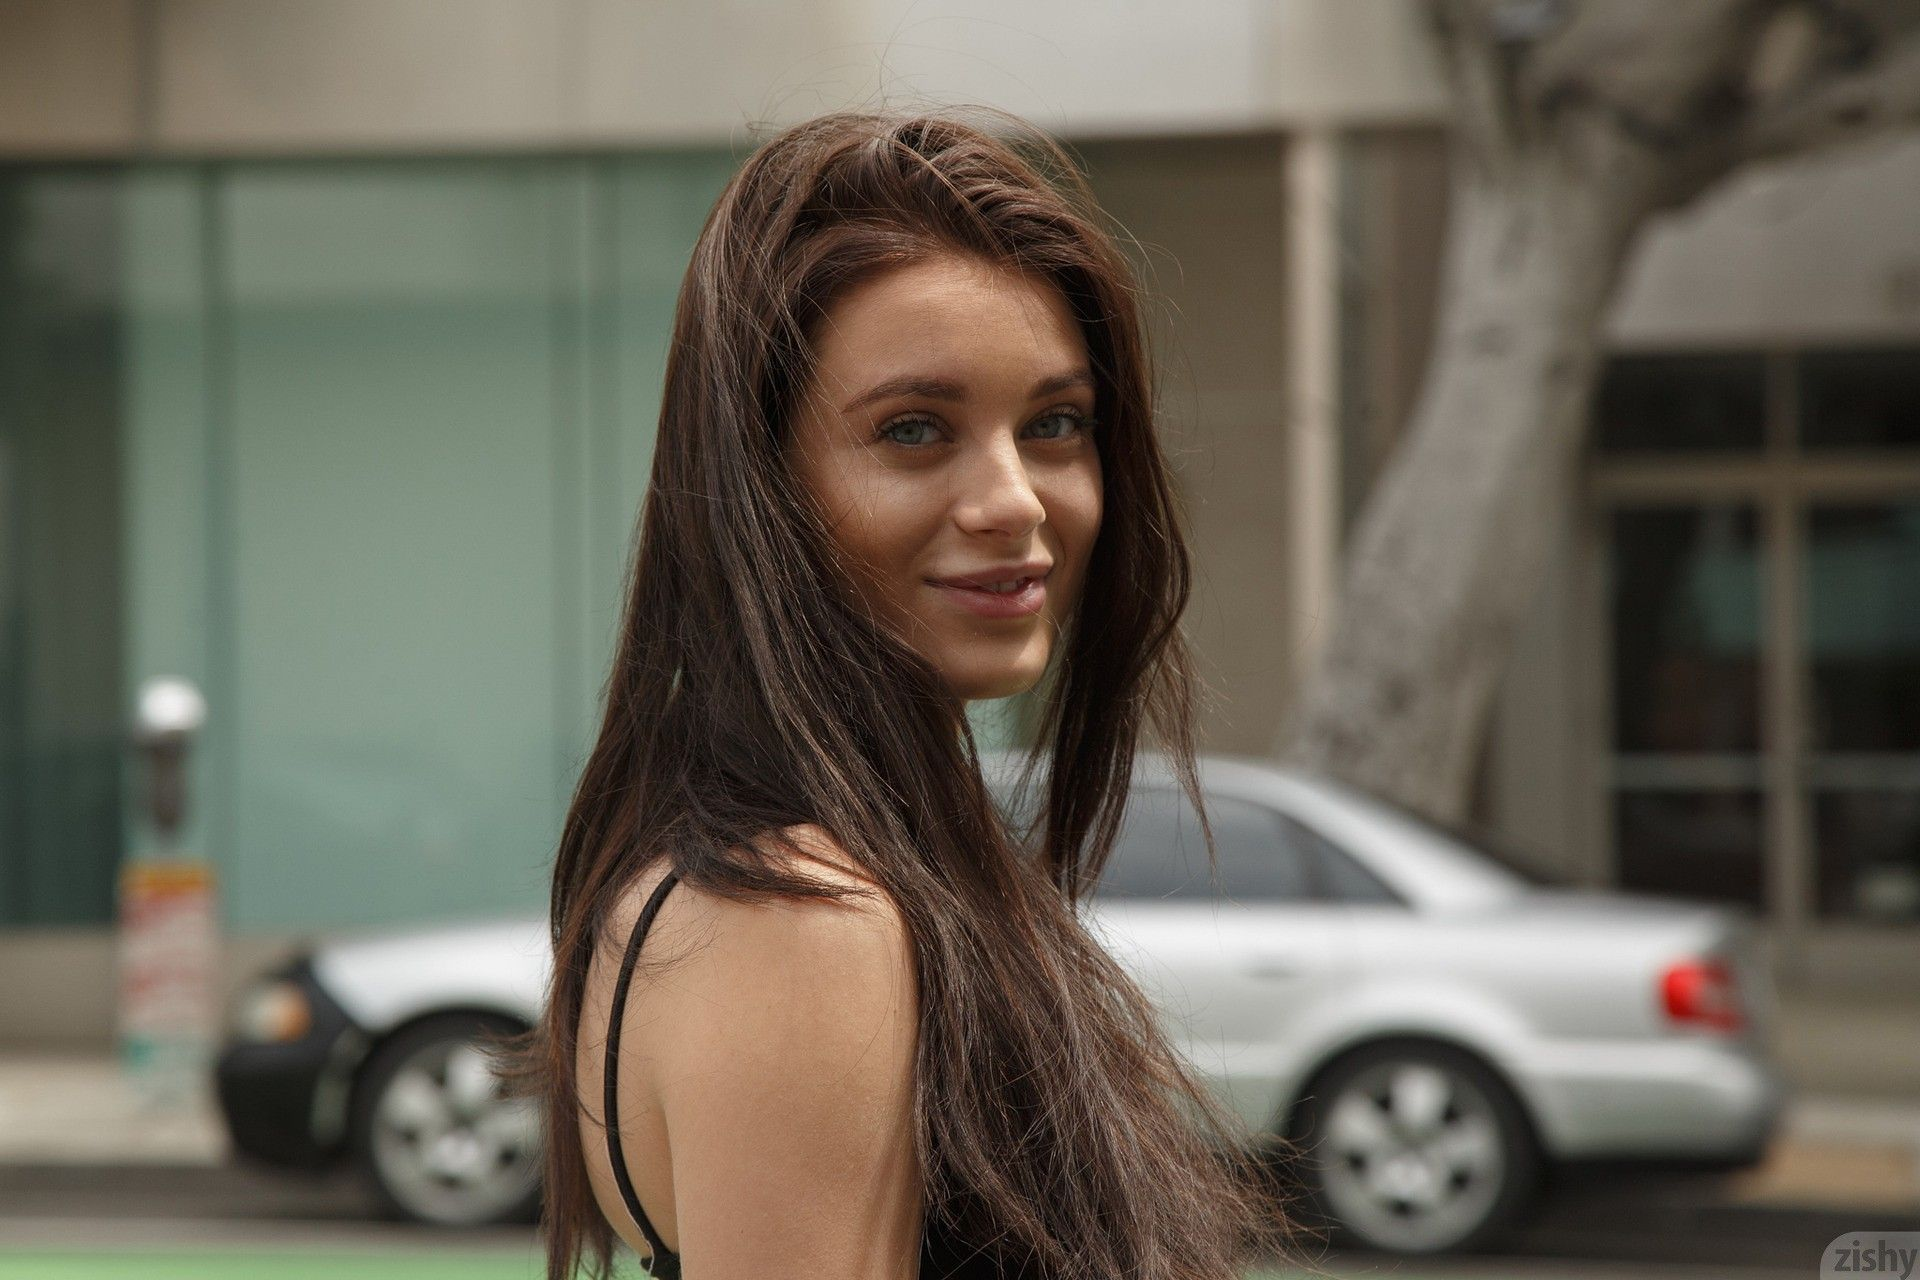 Lana rhoades daughter